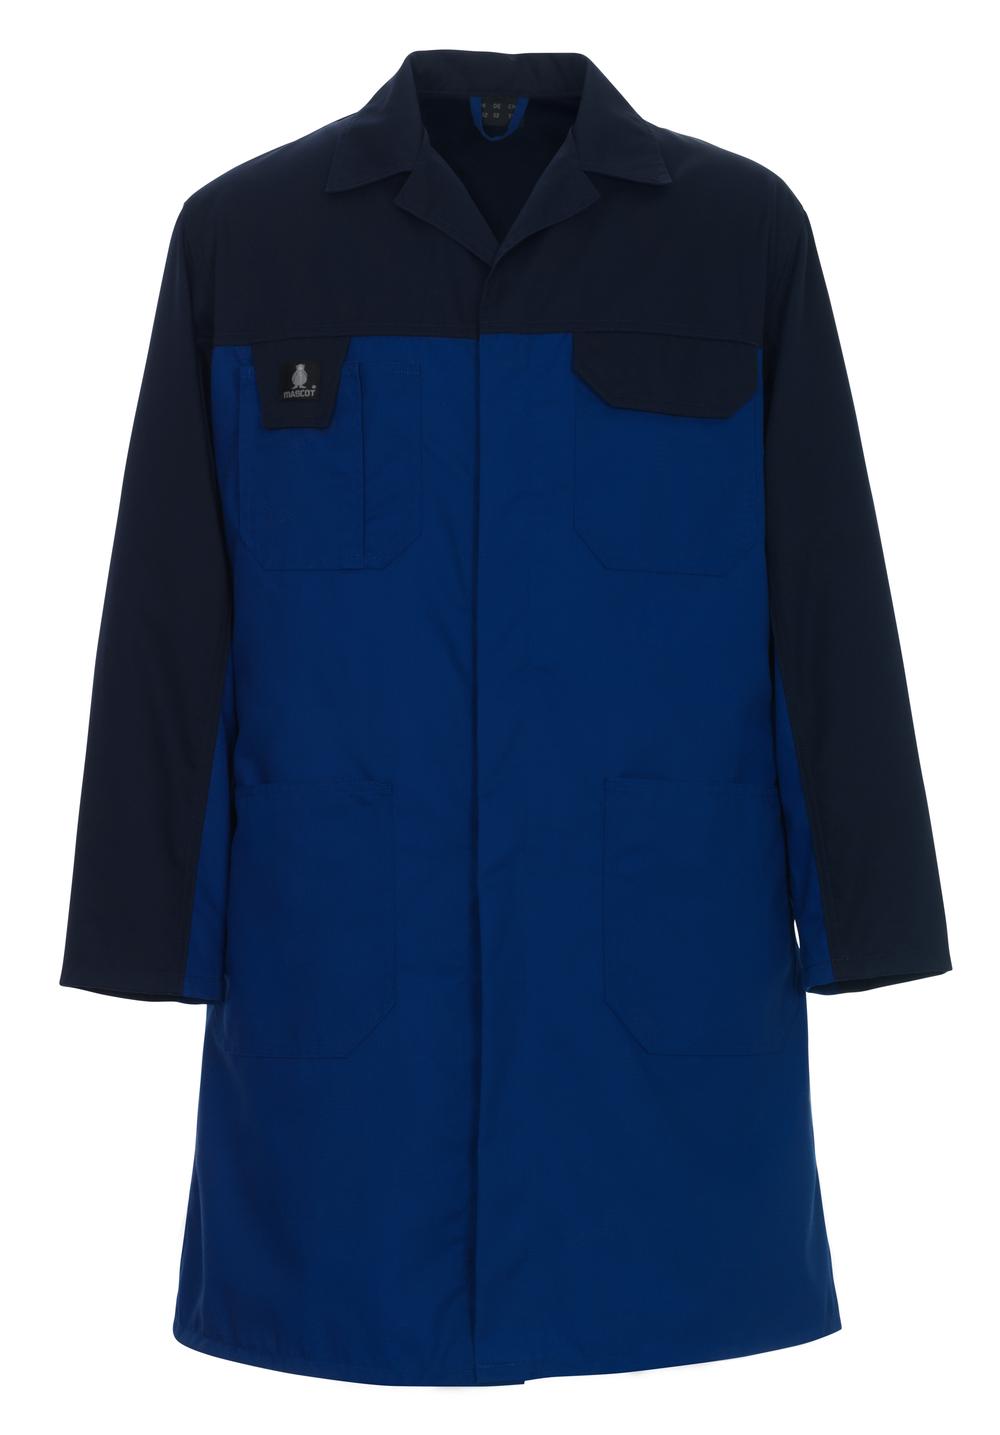 00959-330-1101 Blouse - Bleu roi/Marine